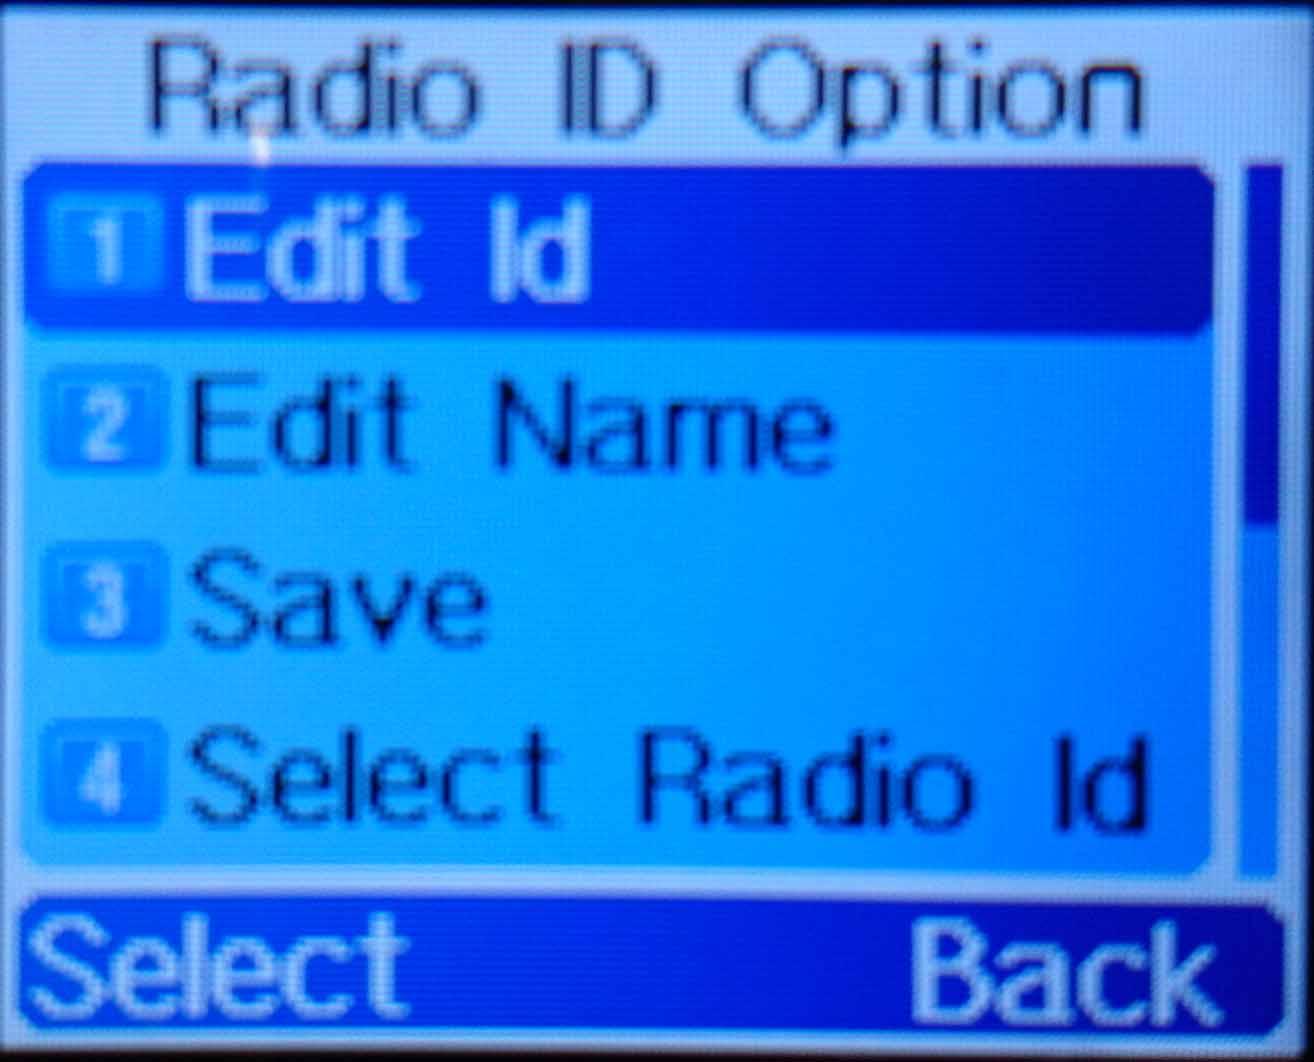 oK03e: ใช้งาน วิทยุ DMR Expert EP-868D, AT-D878AU: การตั้งค่า DMR